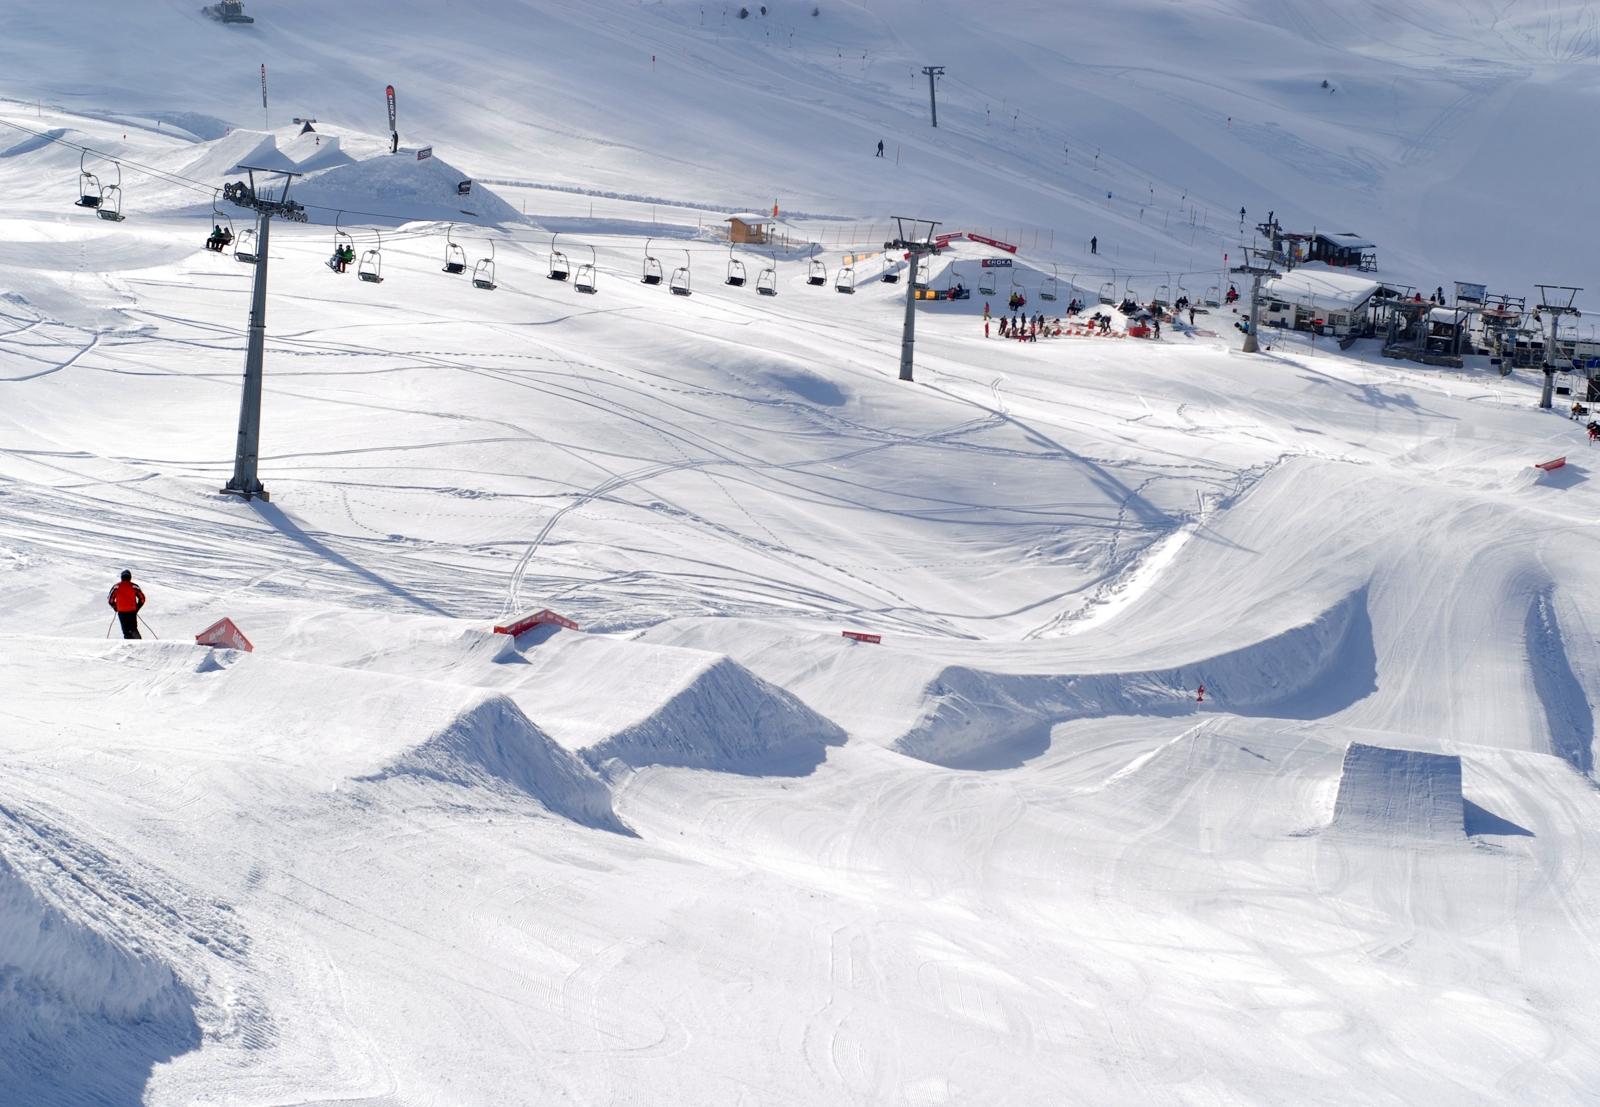 KAM_001000_QPark-Snow-Park-Kitzbueheler-Horn_Archiv-Kitzbuehel-Tourismus